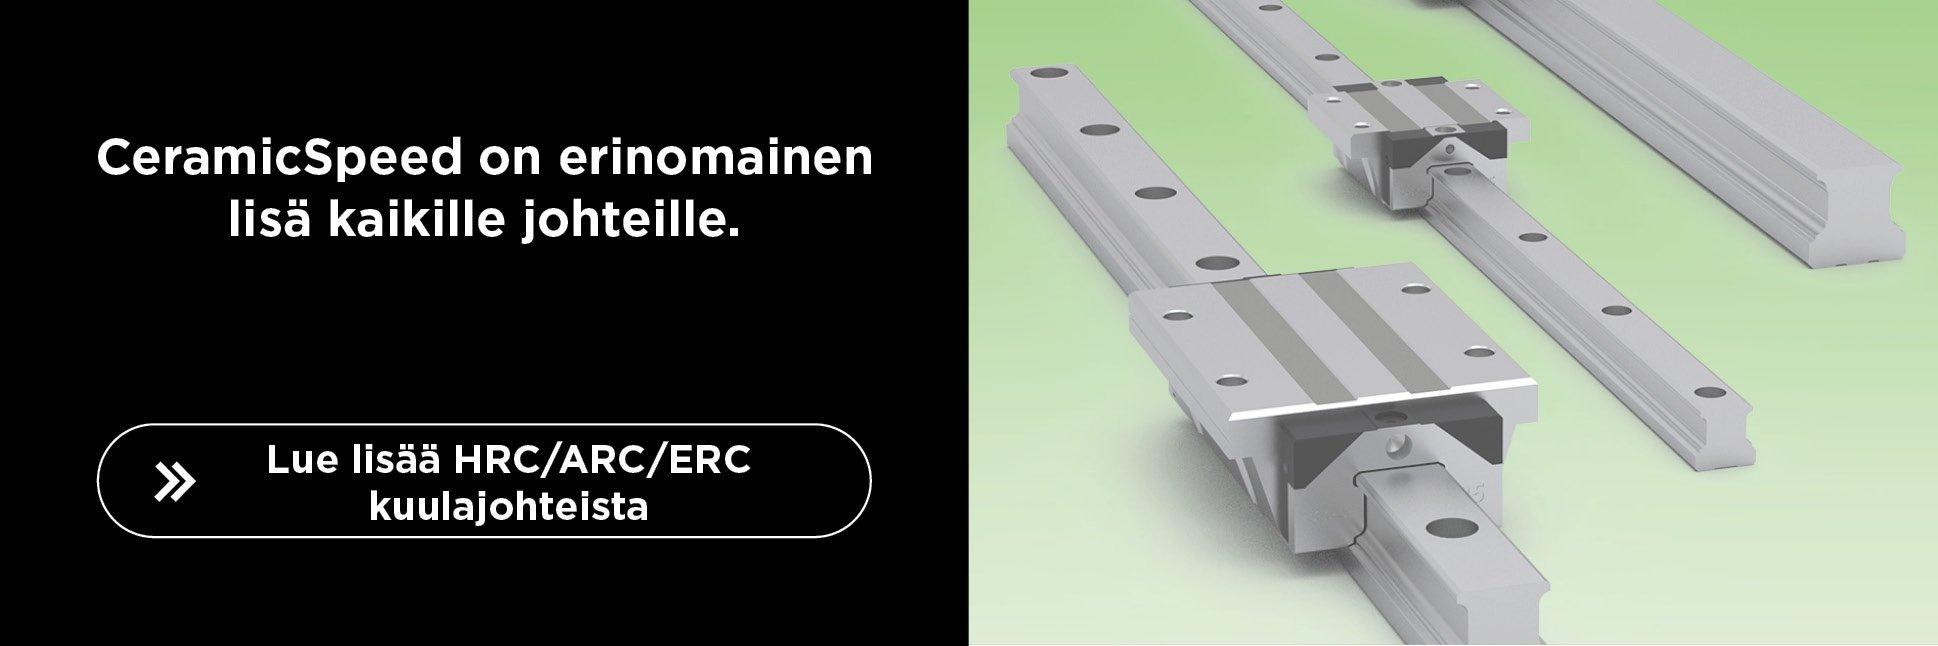 kuulajohteista HRC/ARC/ERC